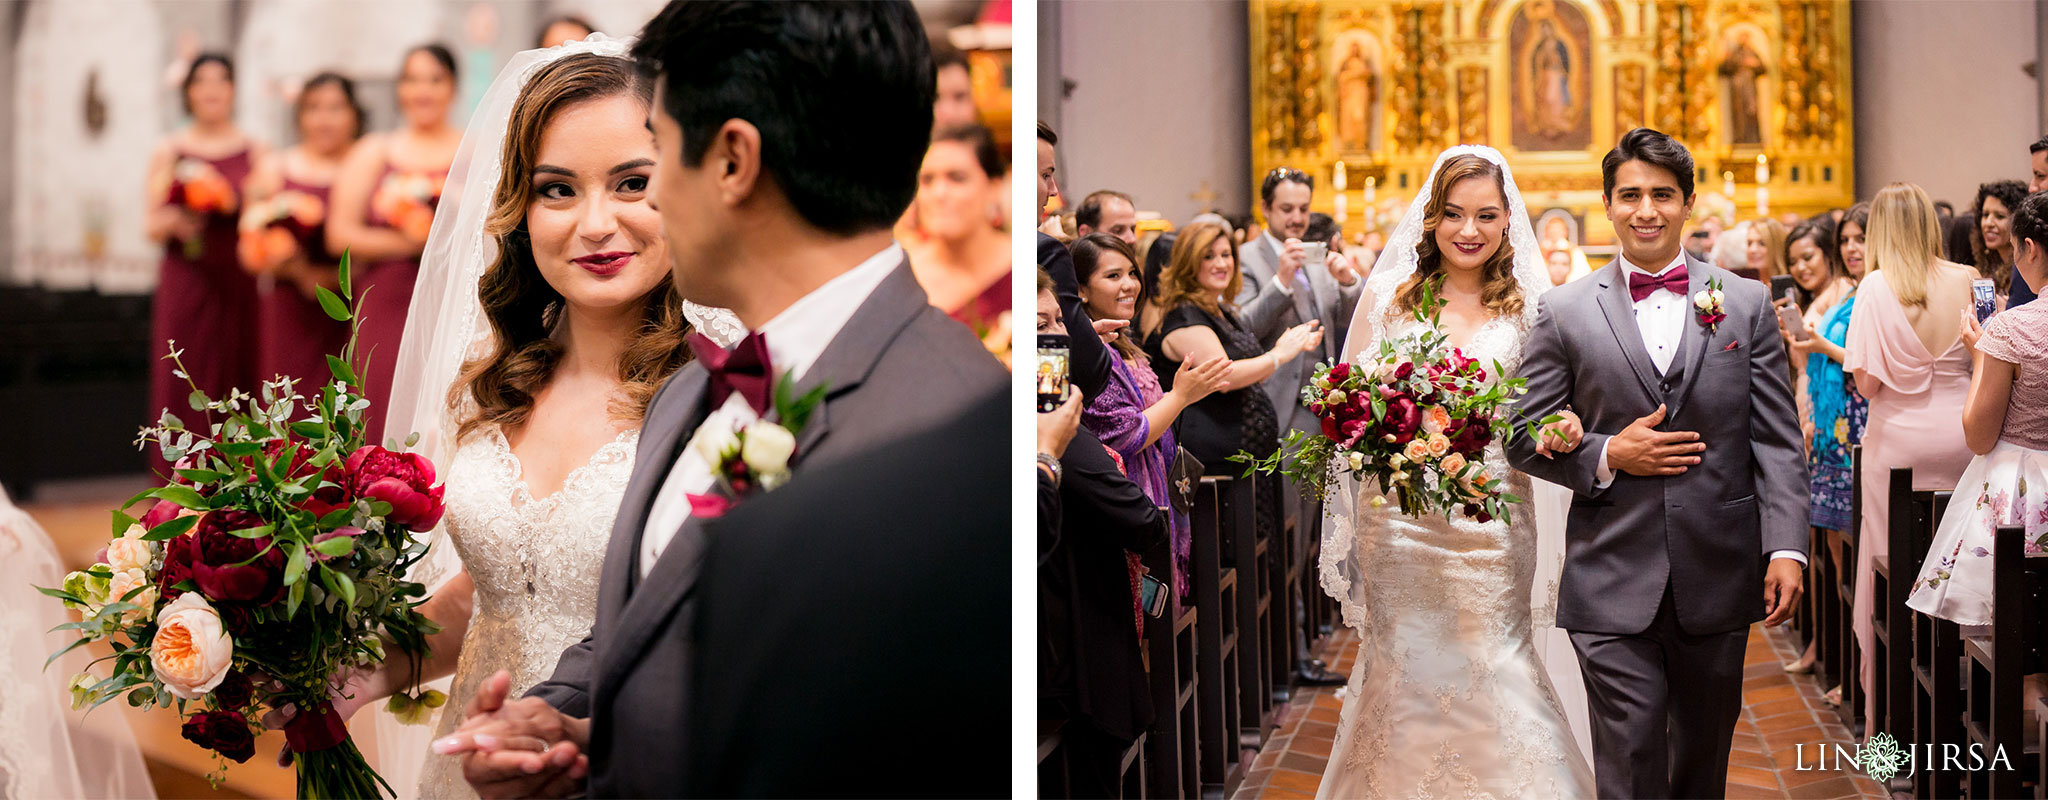 27 mission basilica san juan capistrano wedding ceremony photography